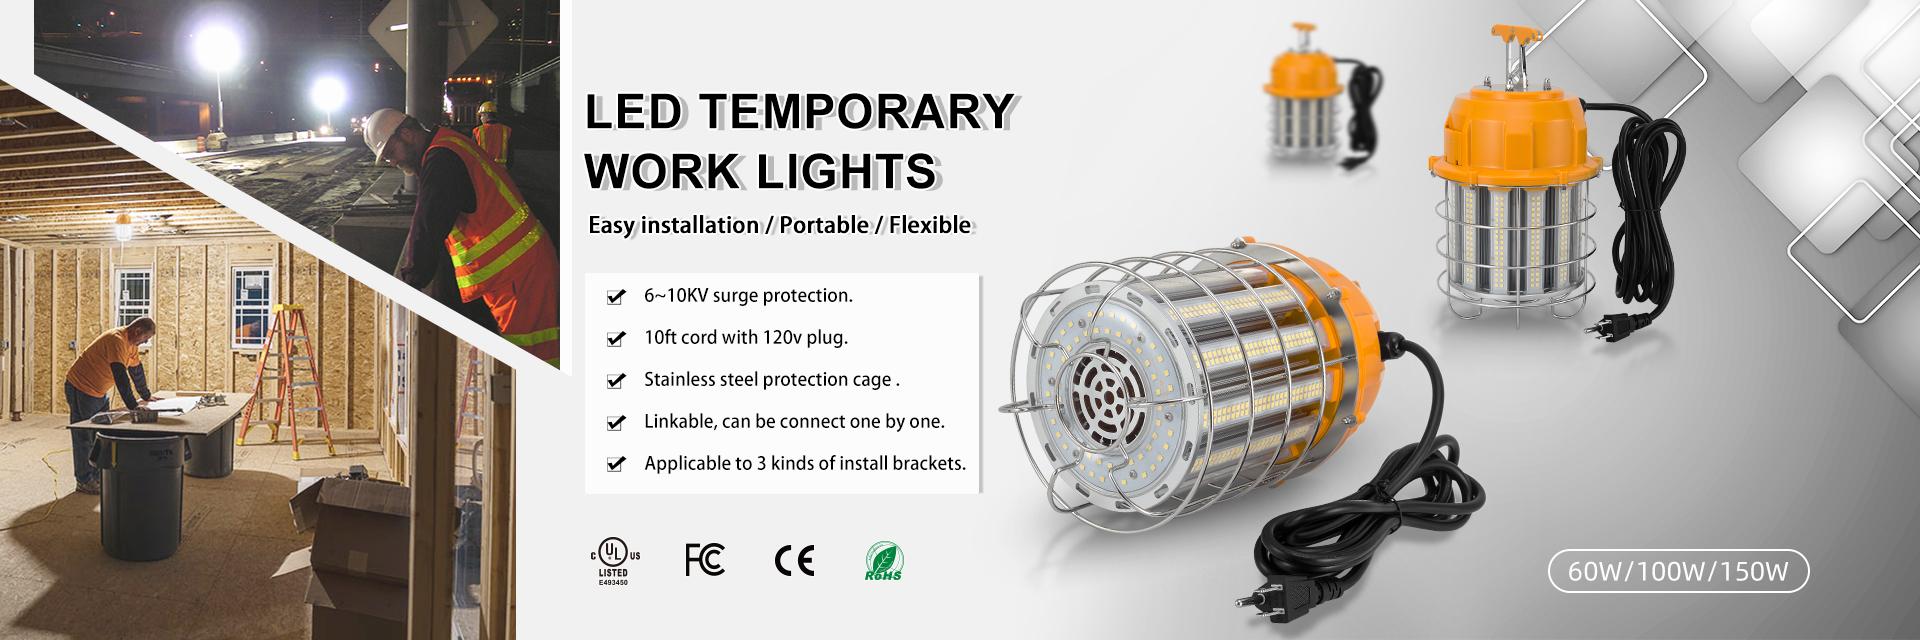 LED Temporary Work Light